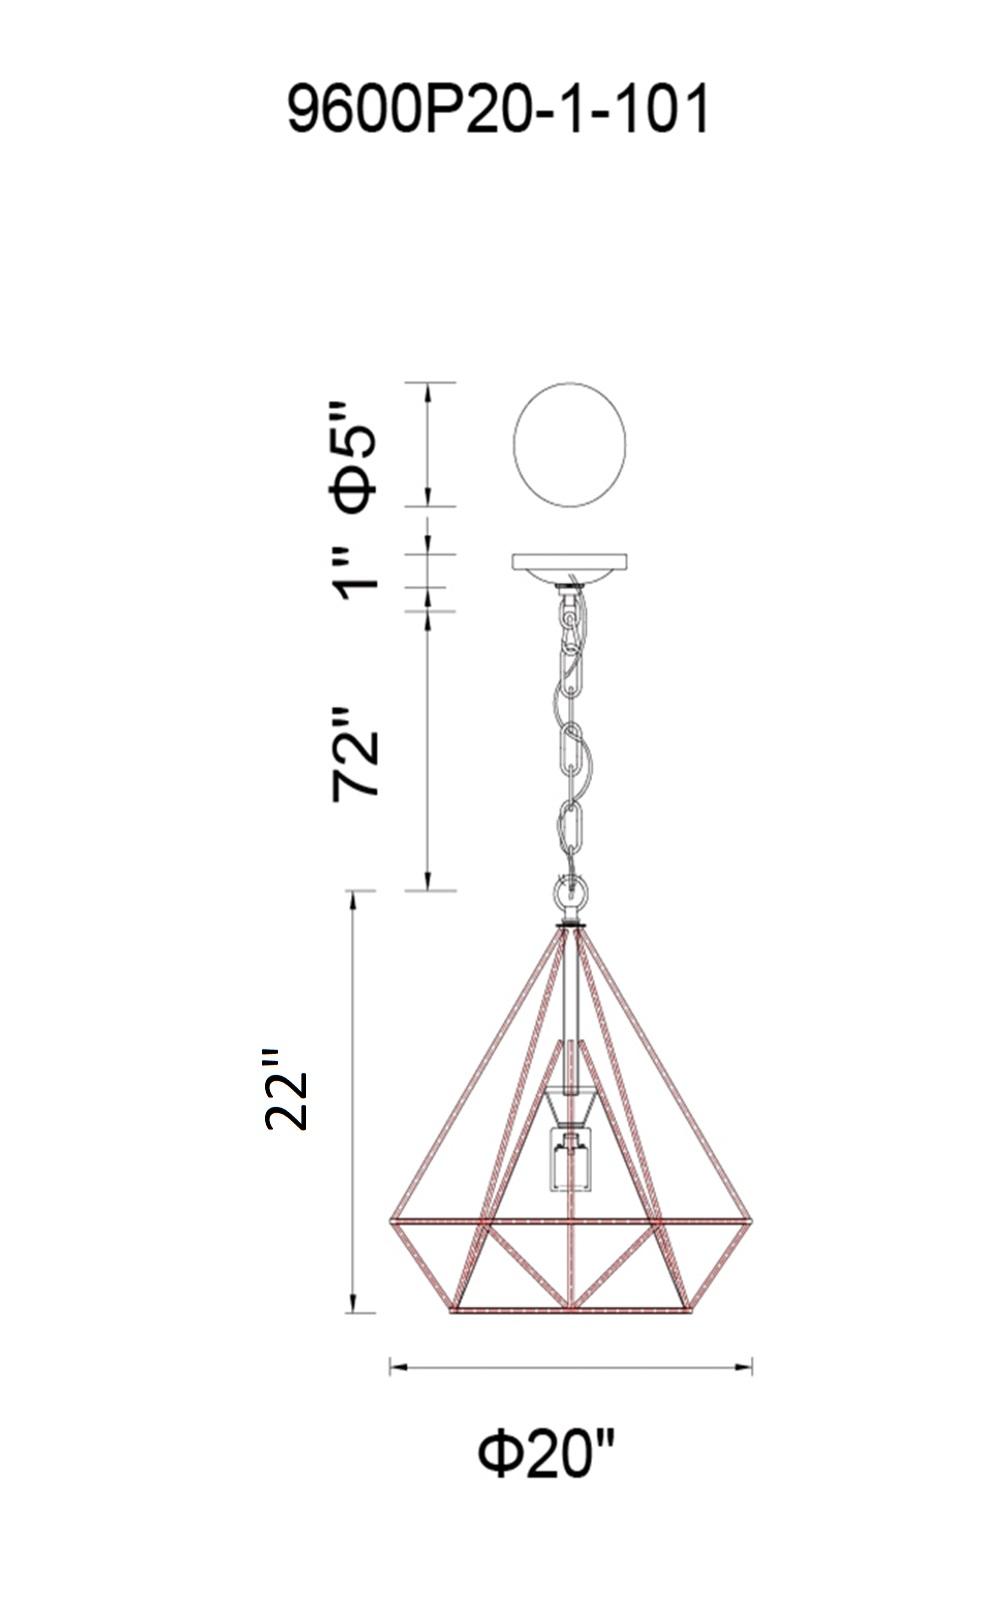 CWI Lighting Diamond 1 Light Down Pendant With Black Finish Model: 9600P20-1-101 Line Drawing